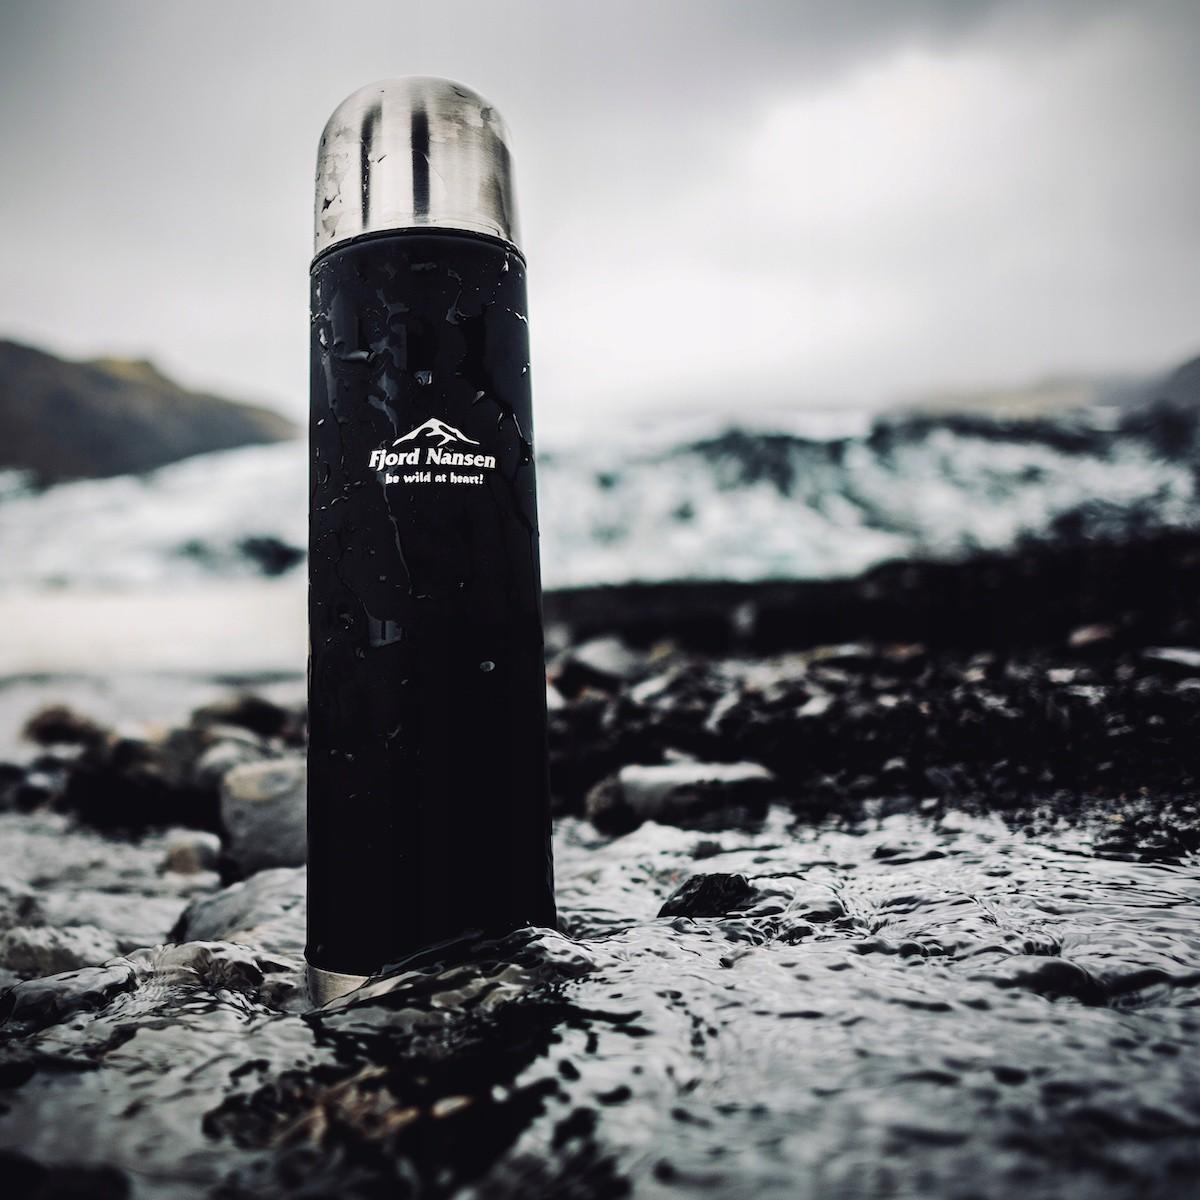 Termoska Fjord Nansen Honer 1L megamix.sk